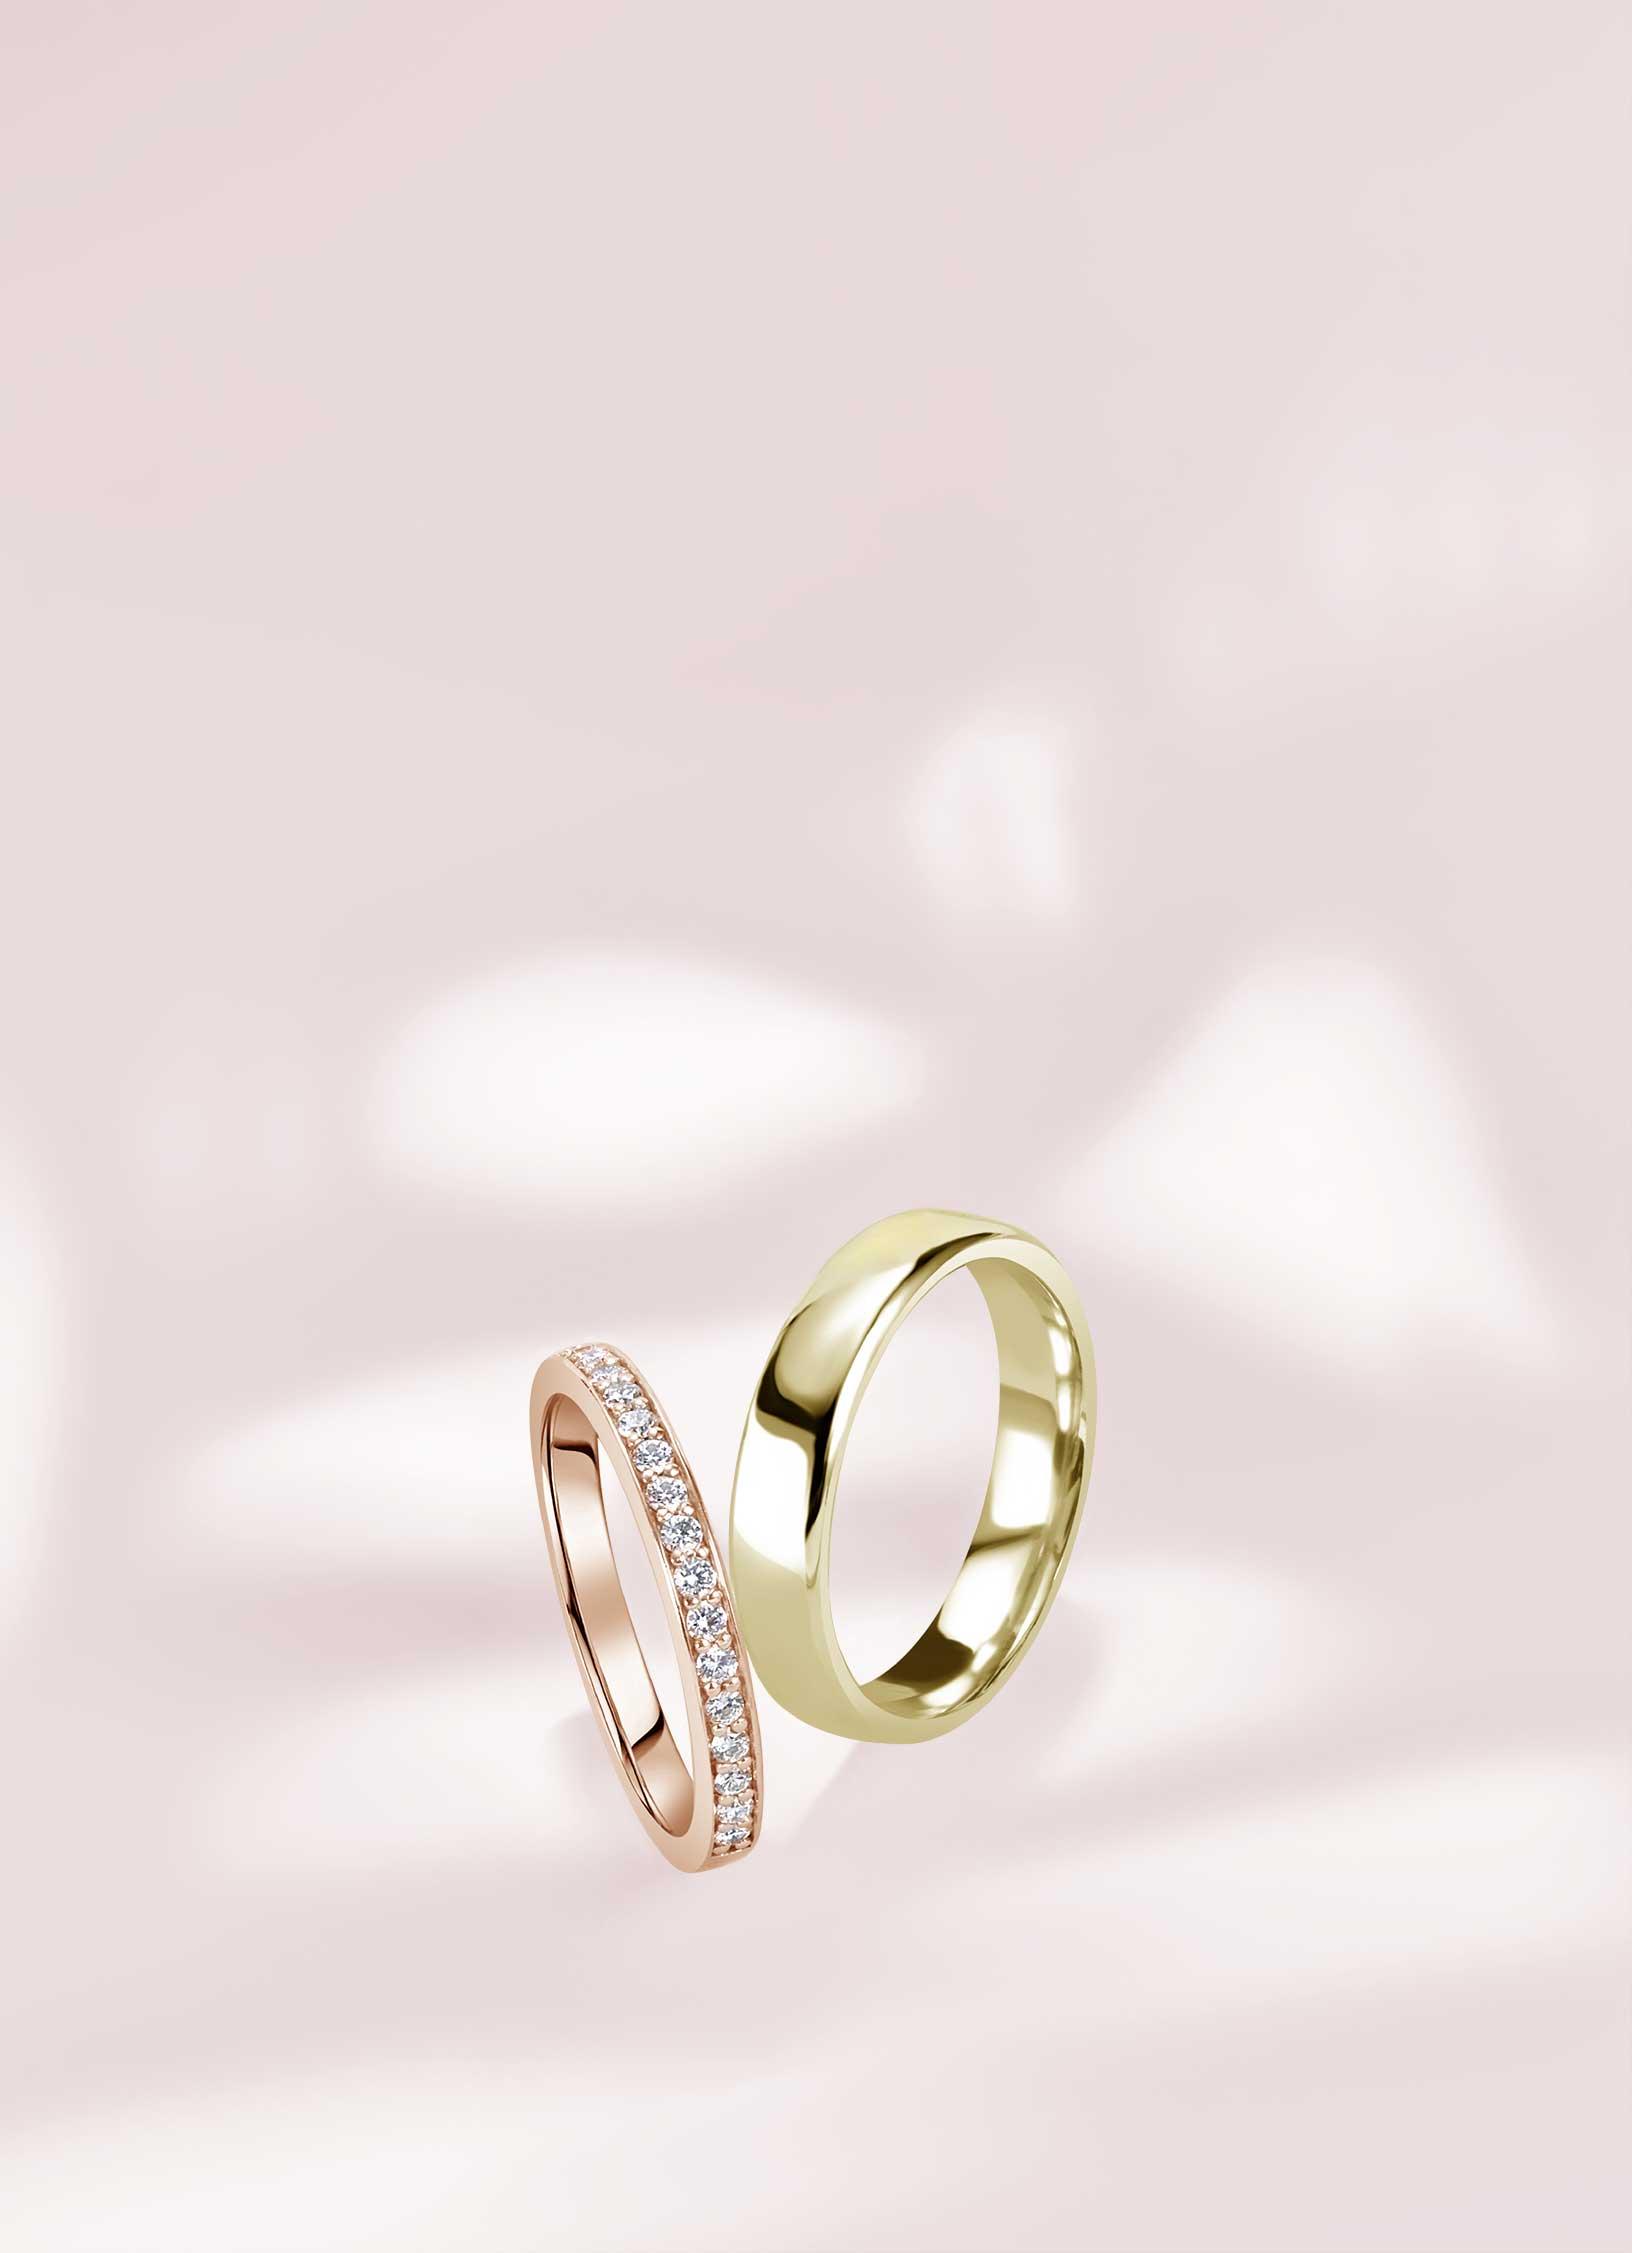 Wedding & Eternity Rings | Bespoke Wedding Rings | Wedding Bands | Steven Stone